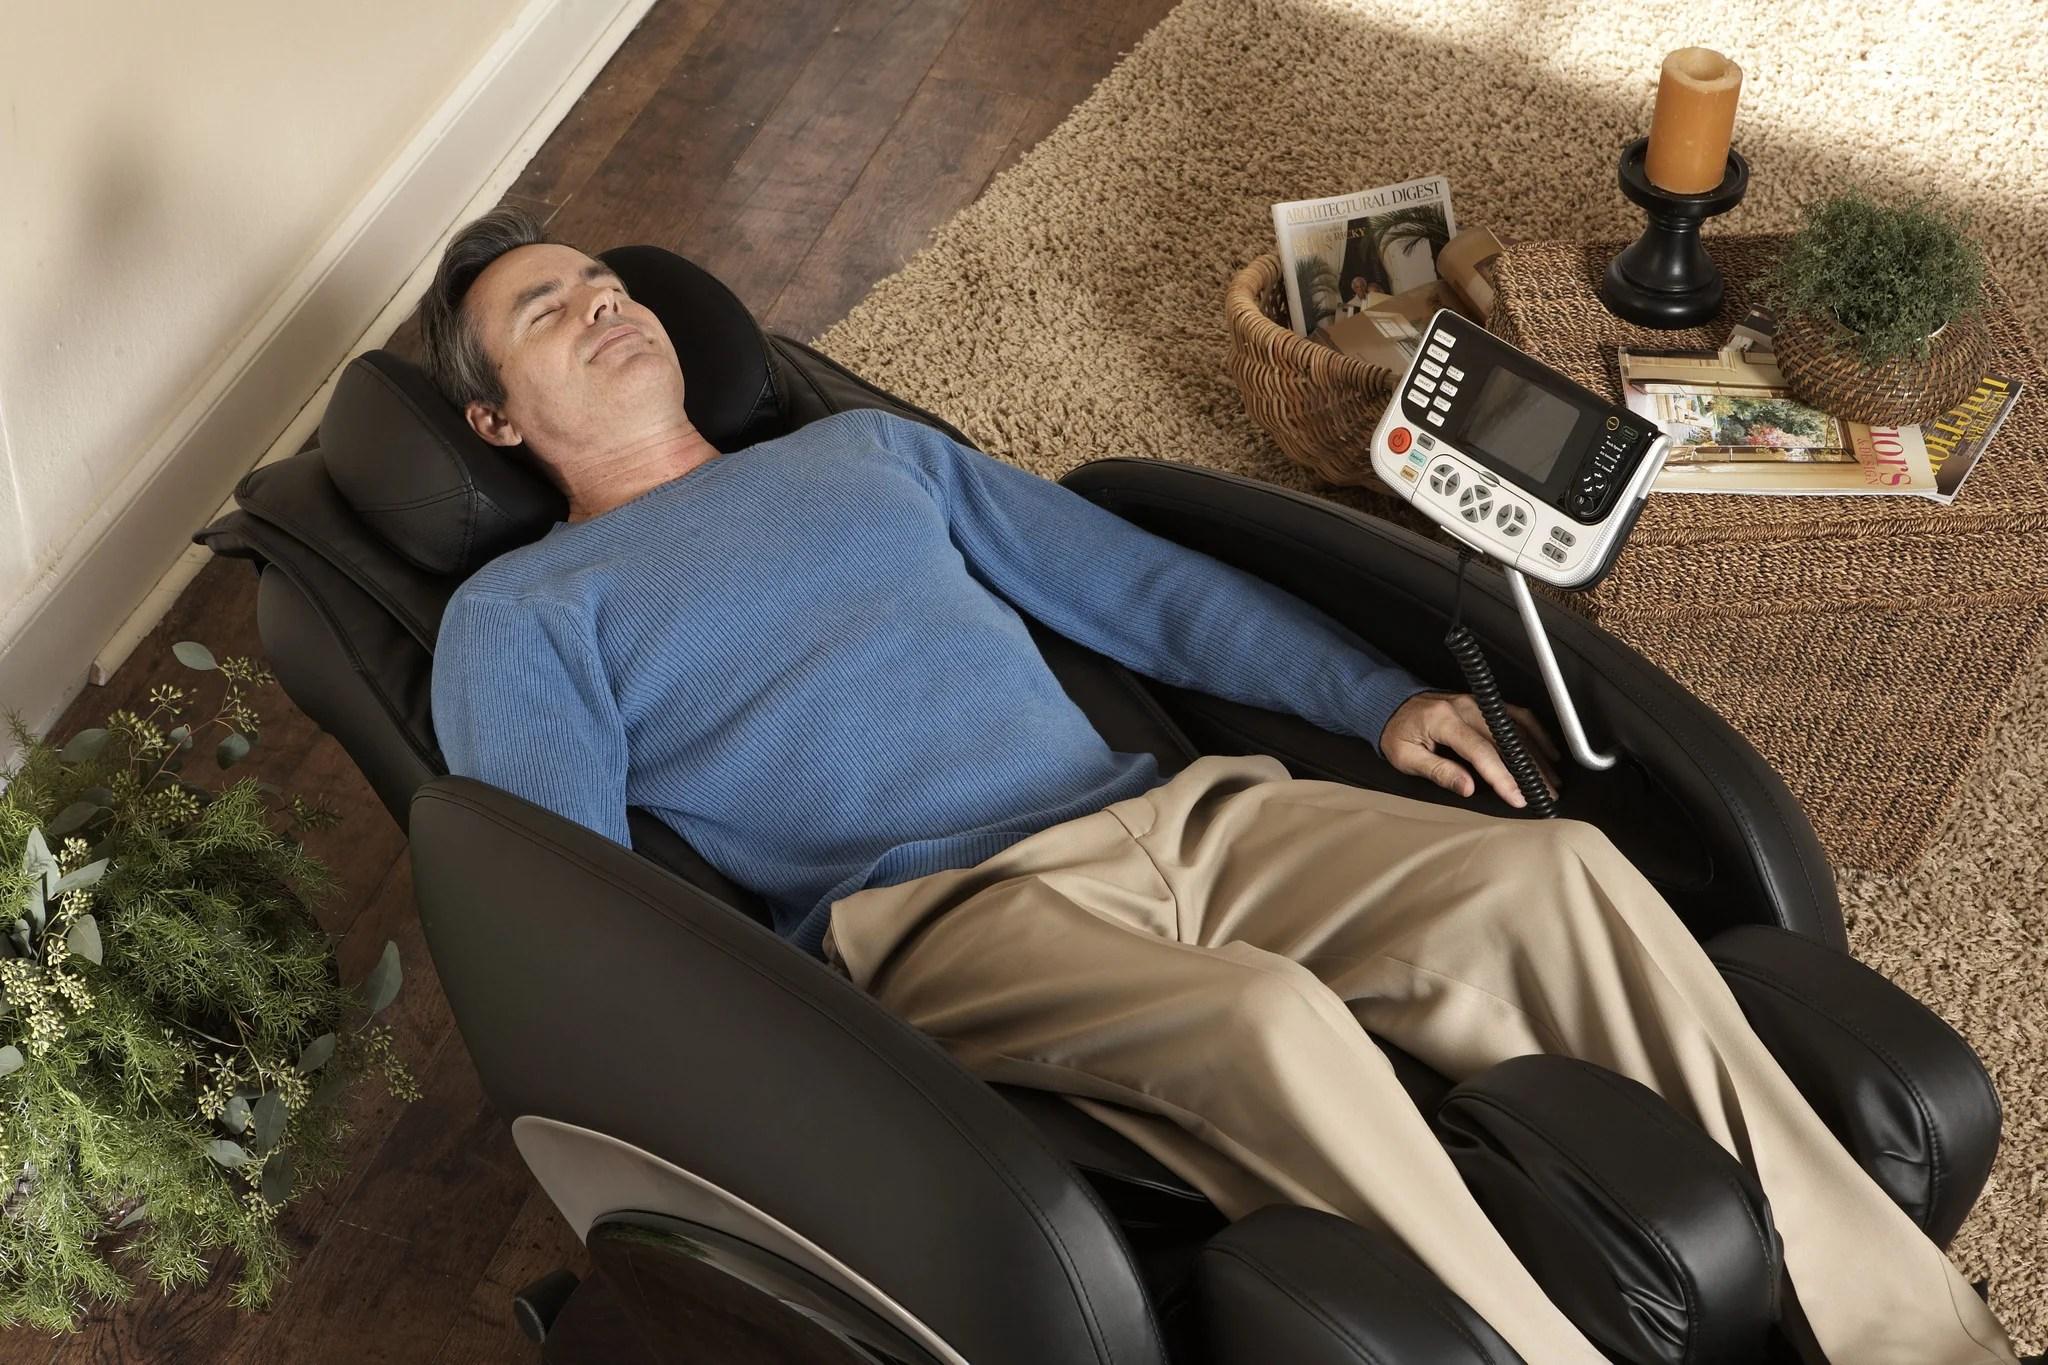 cozzia massage chair reviews white spandex covers canada 16027 zero gravity shiatsu chairs lift